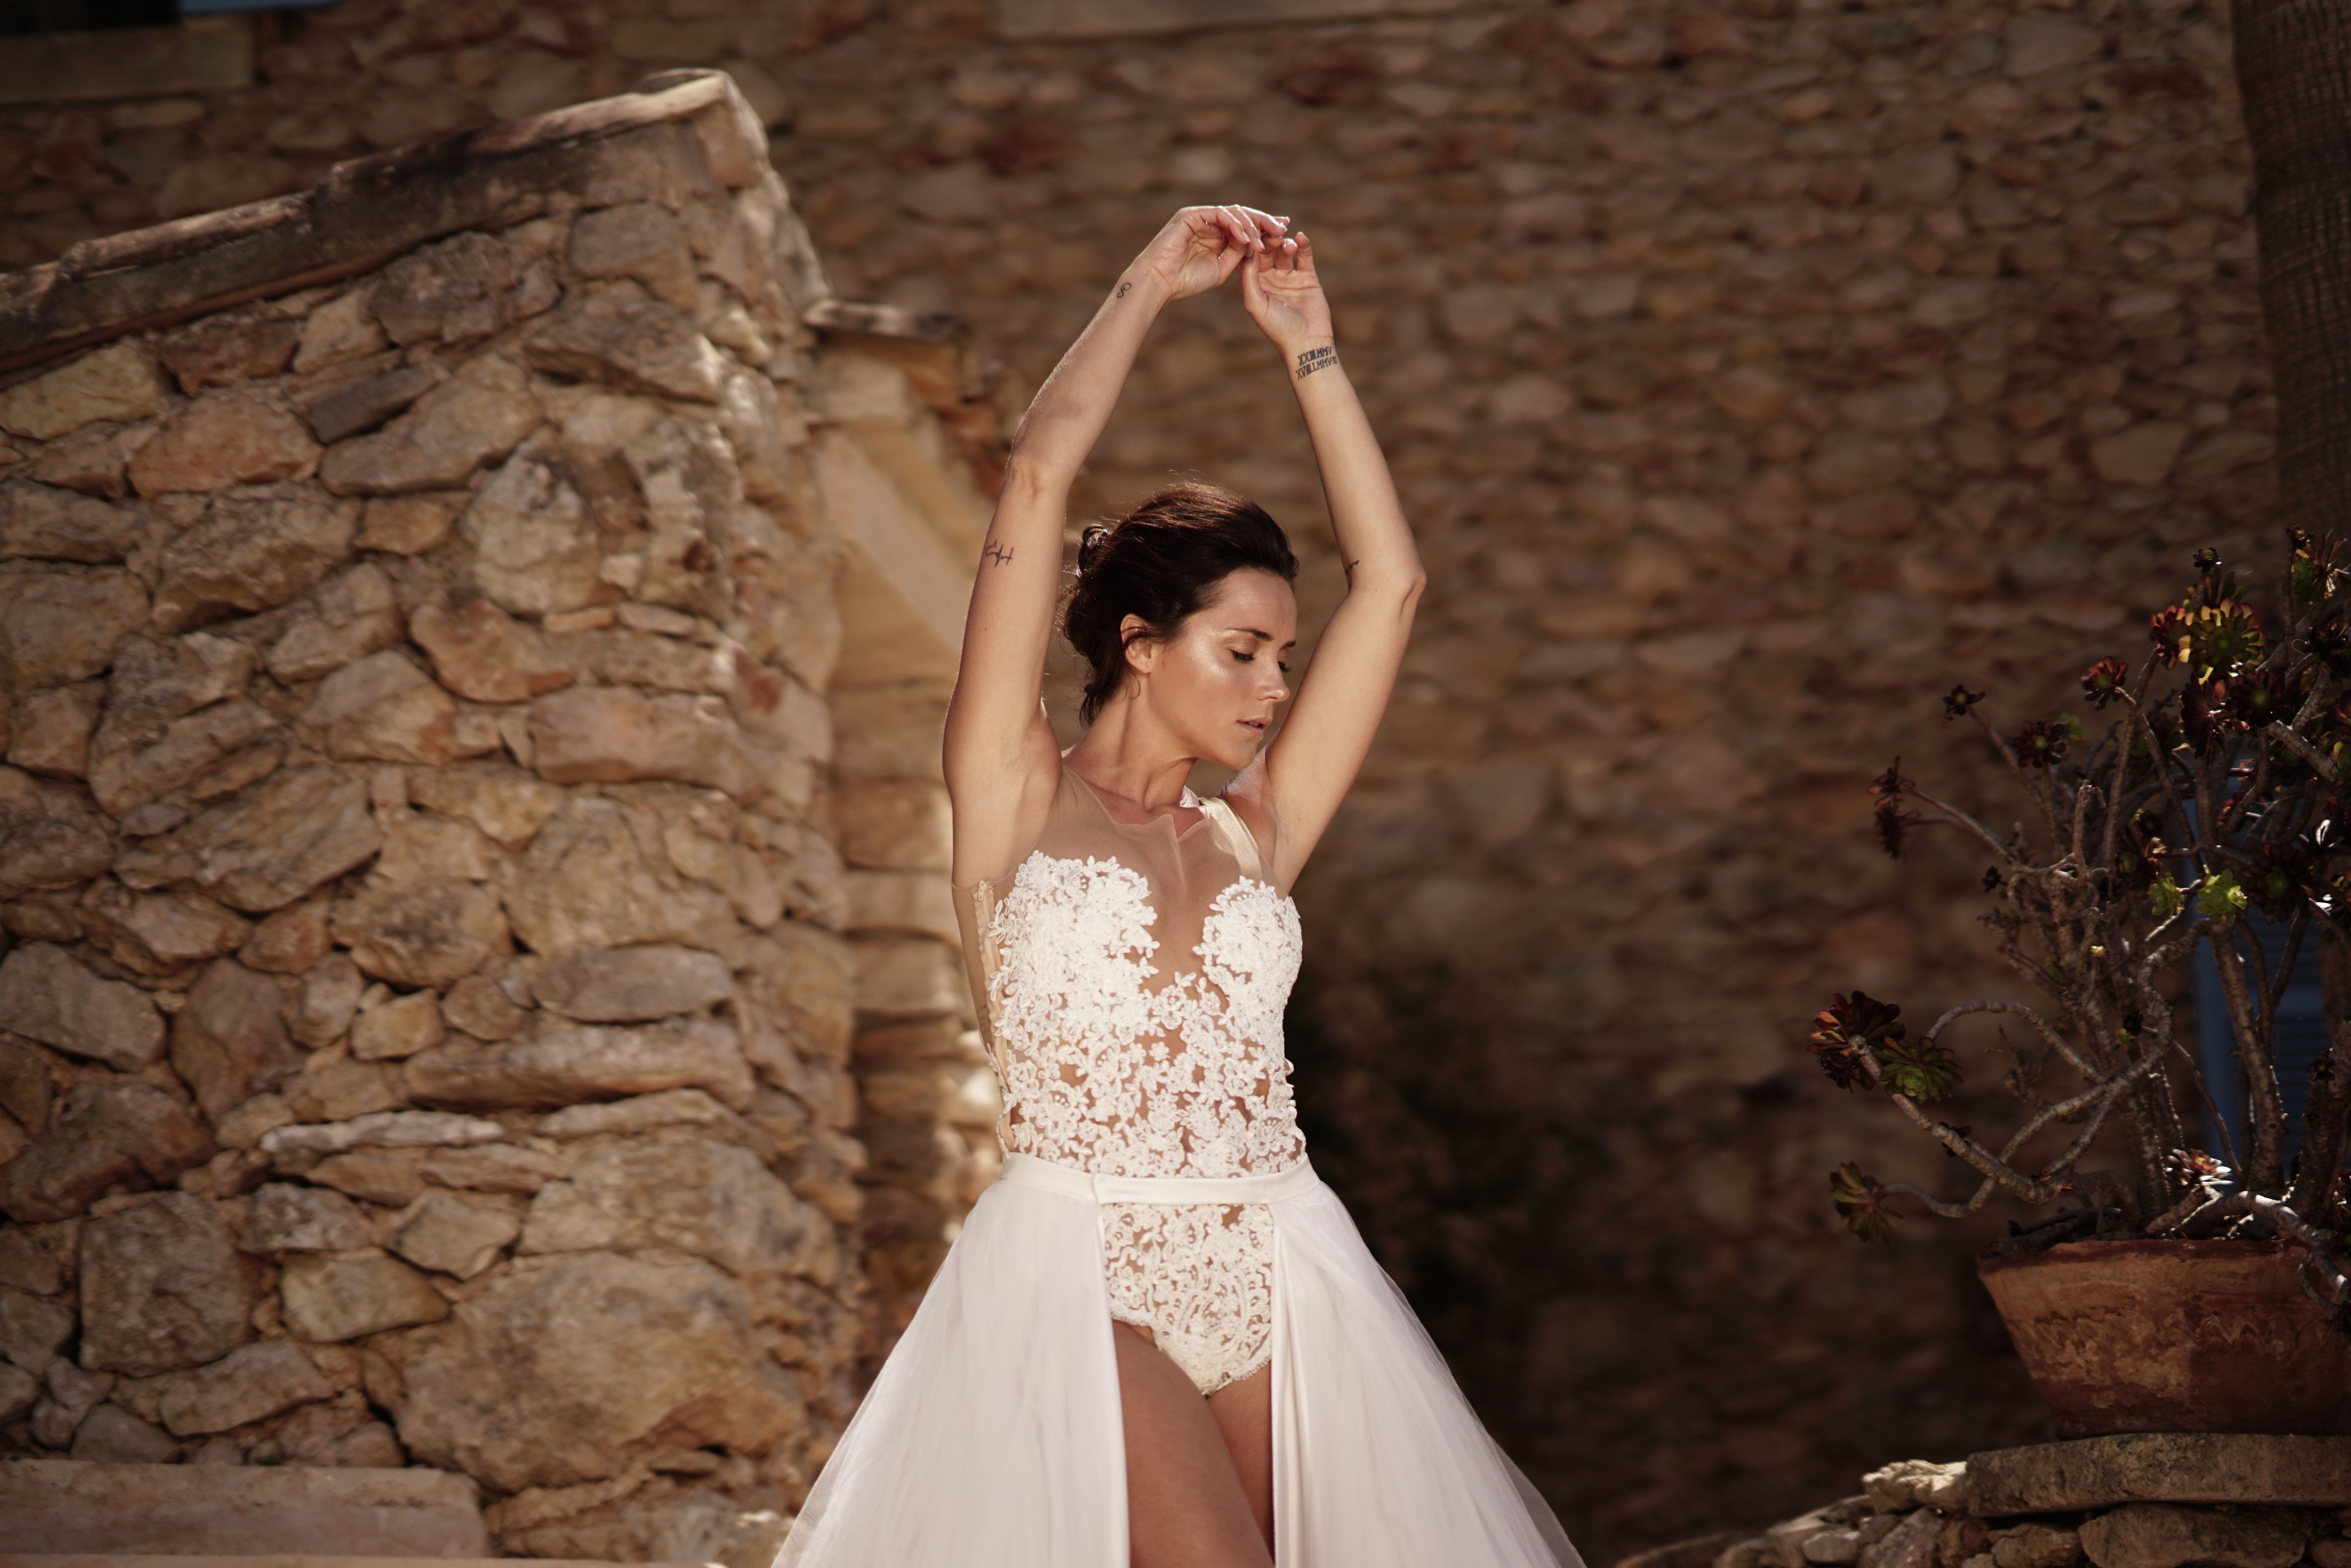 Wedding dress bodysuit  Design by EMANUEL HENDRIK MIX u MATCH    The mode is wearing